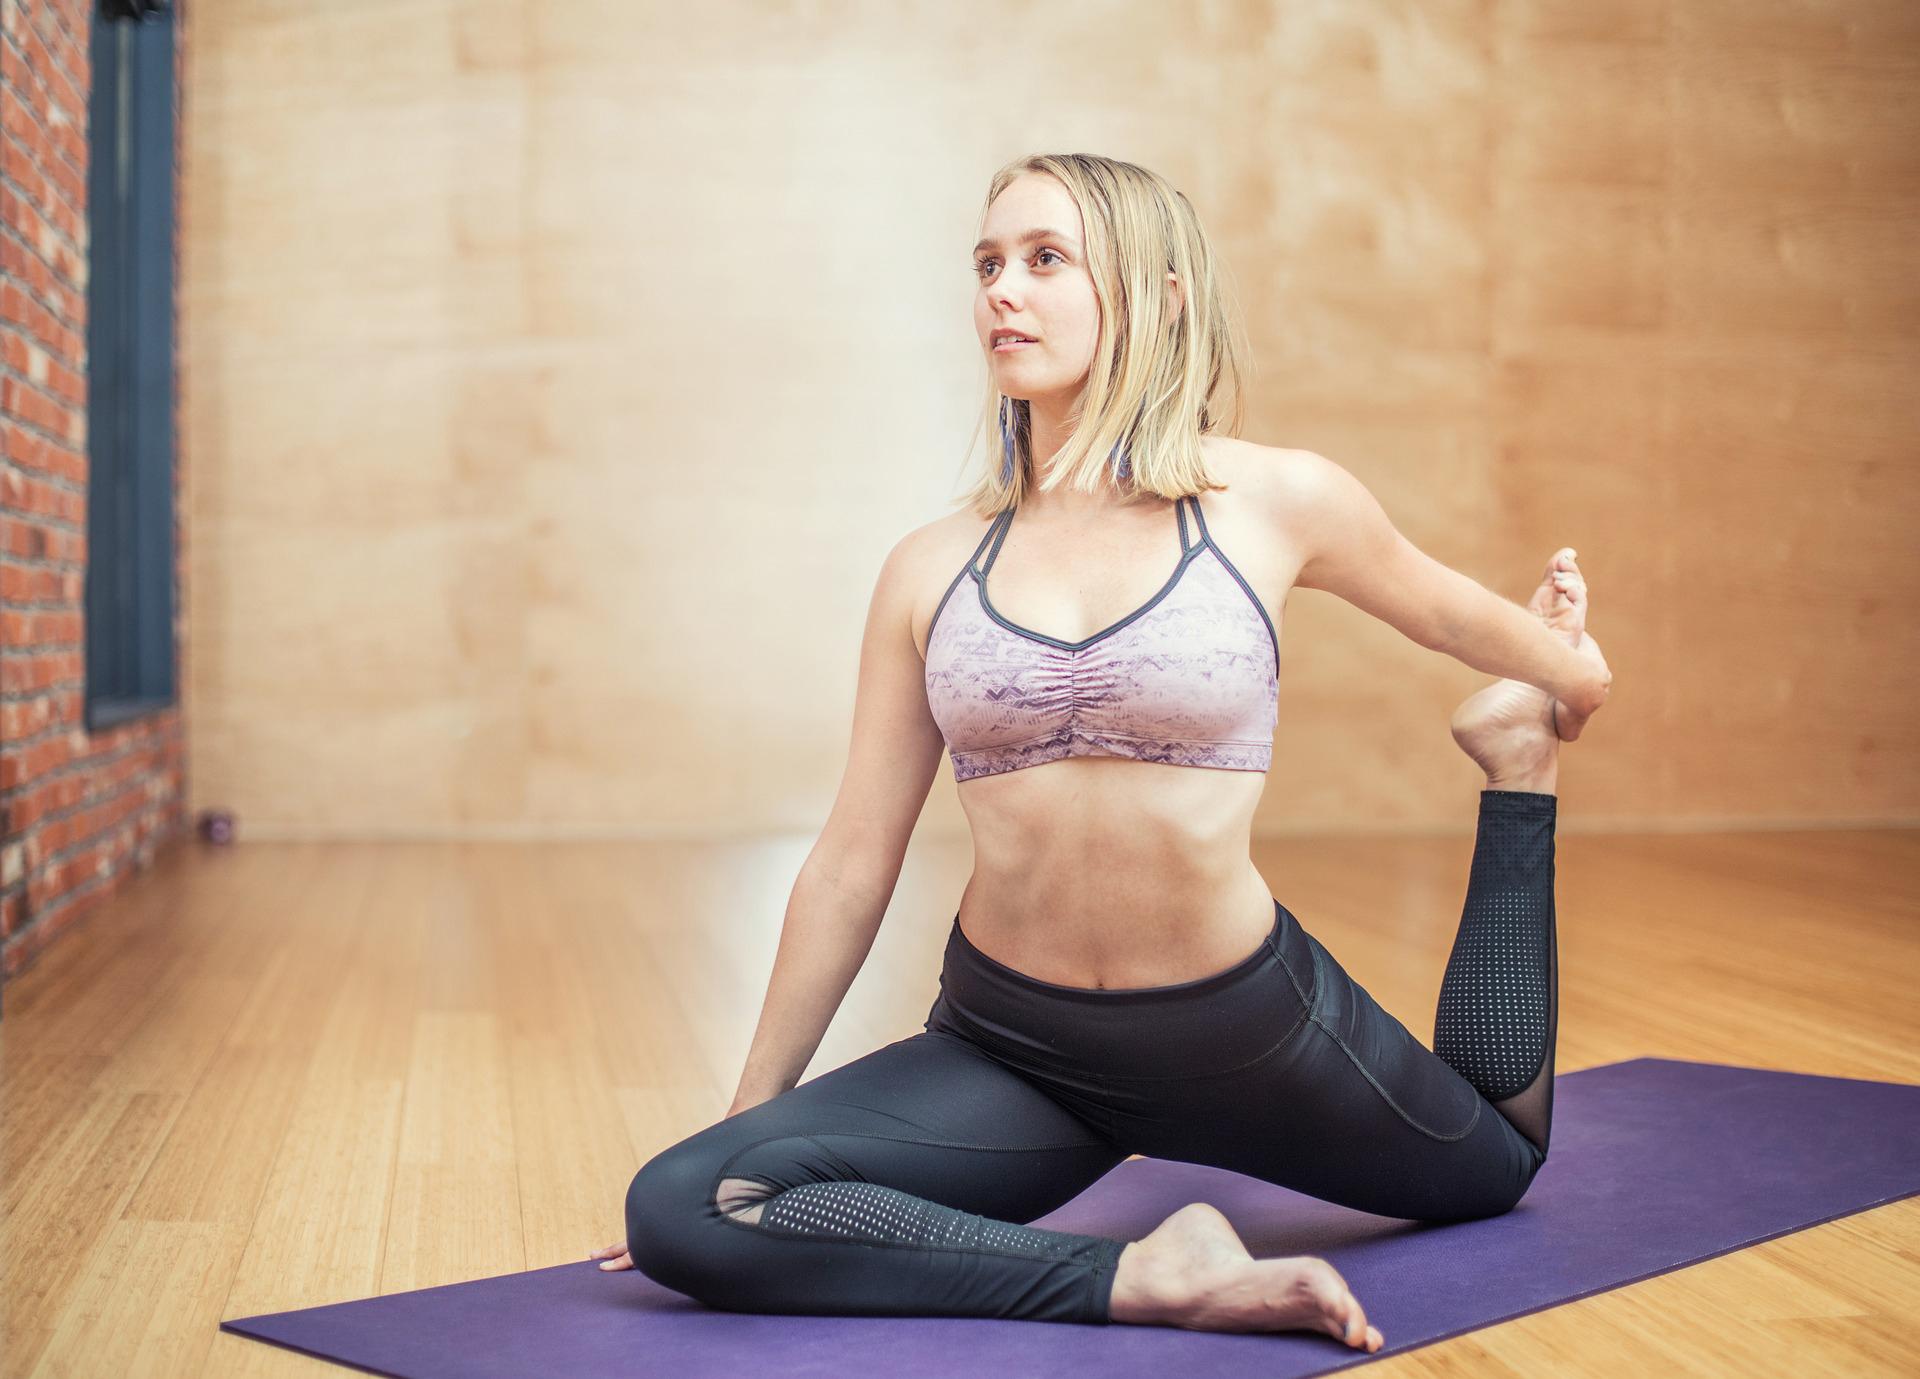 changer grâce au yoga